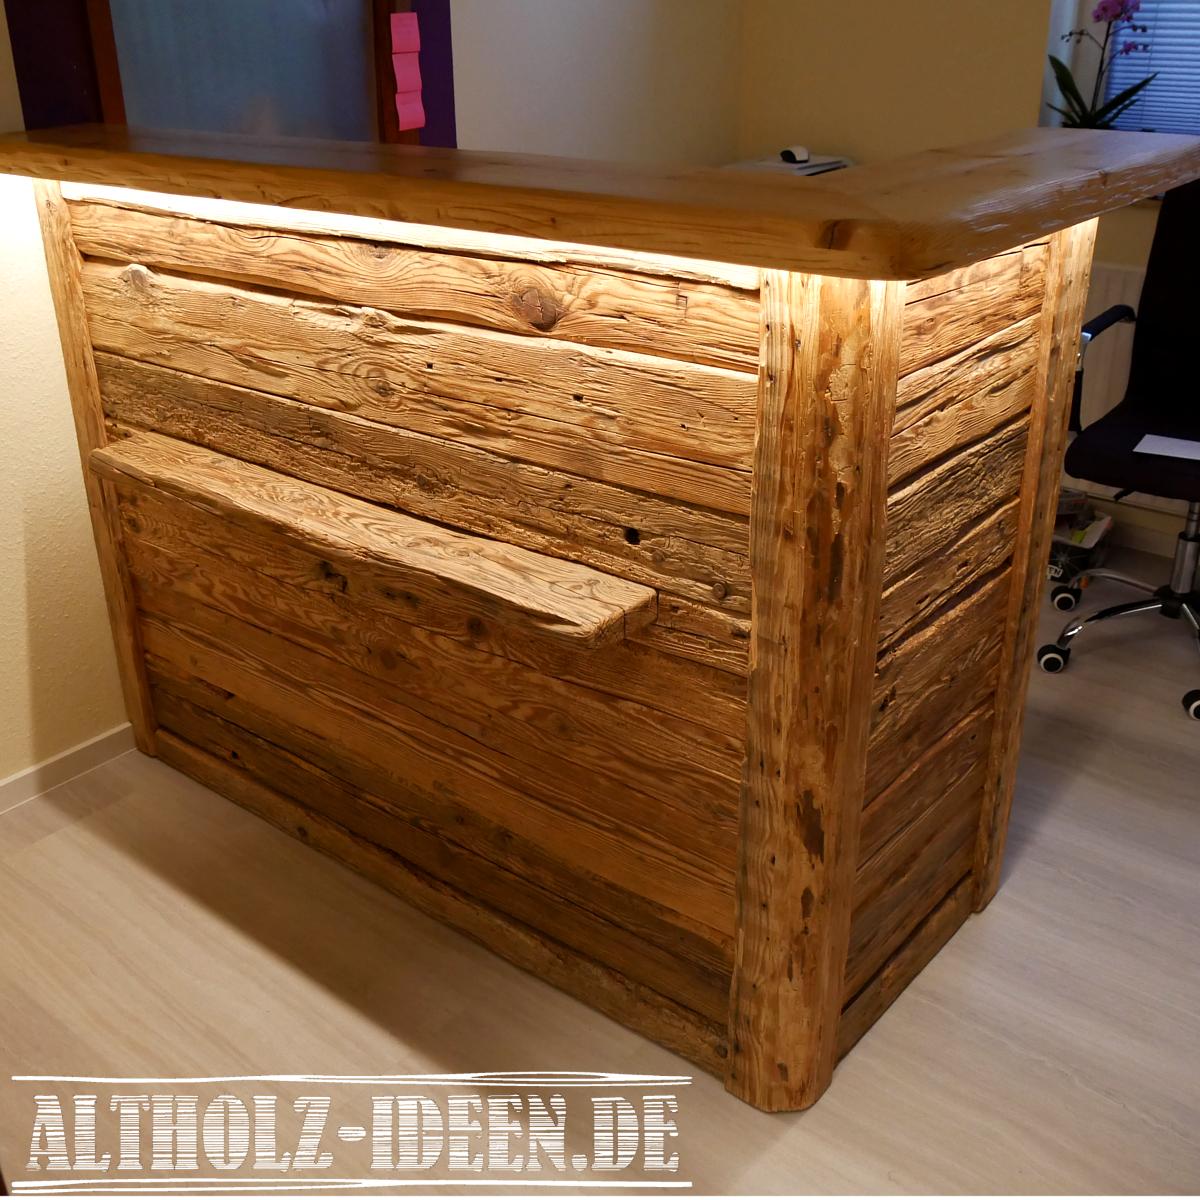 Altholz Theke Mit Beleuchtung Fur Einen Beeindruckenden Empfang Altholz Holz Mobel Aus Altholz